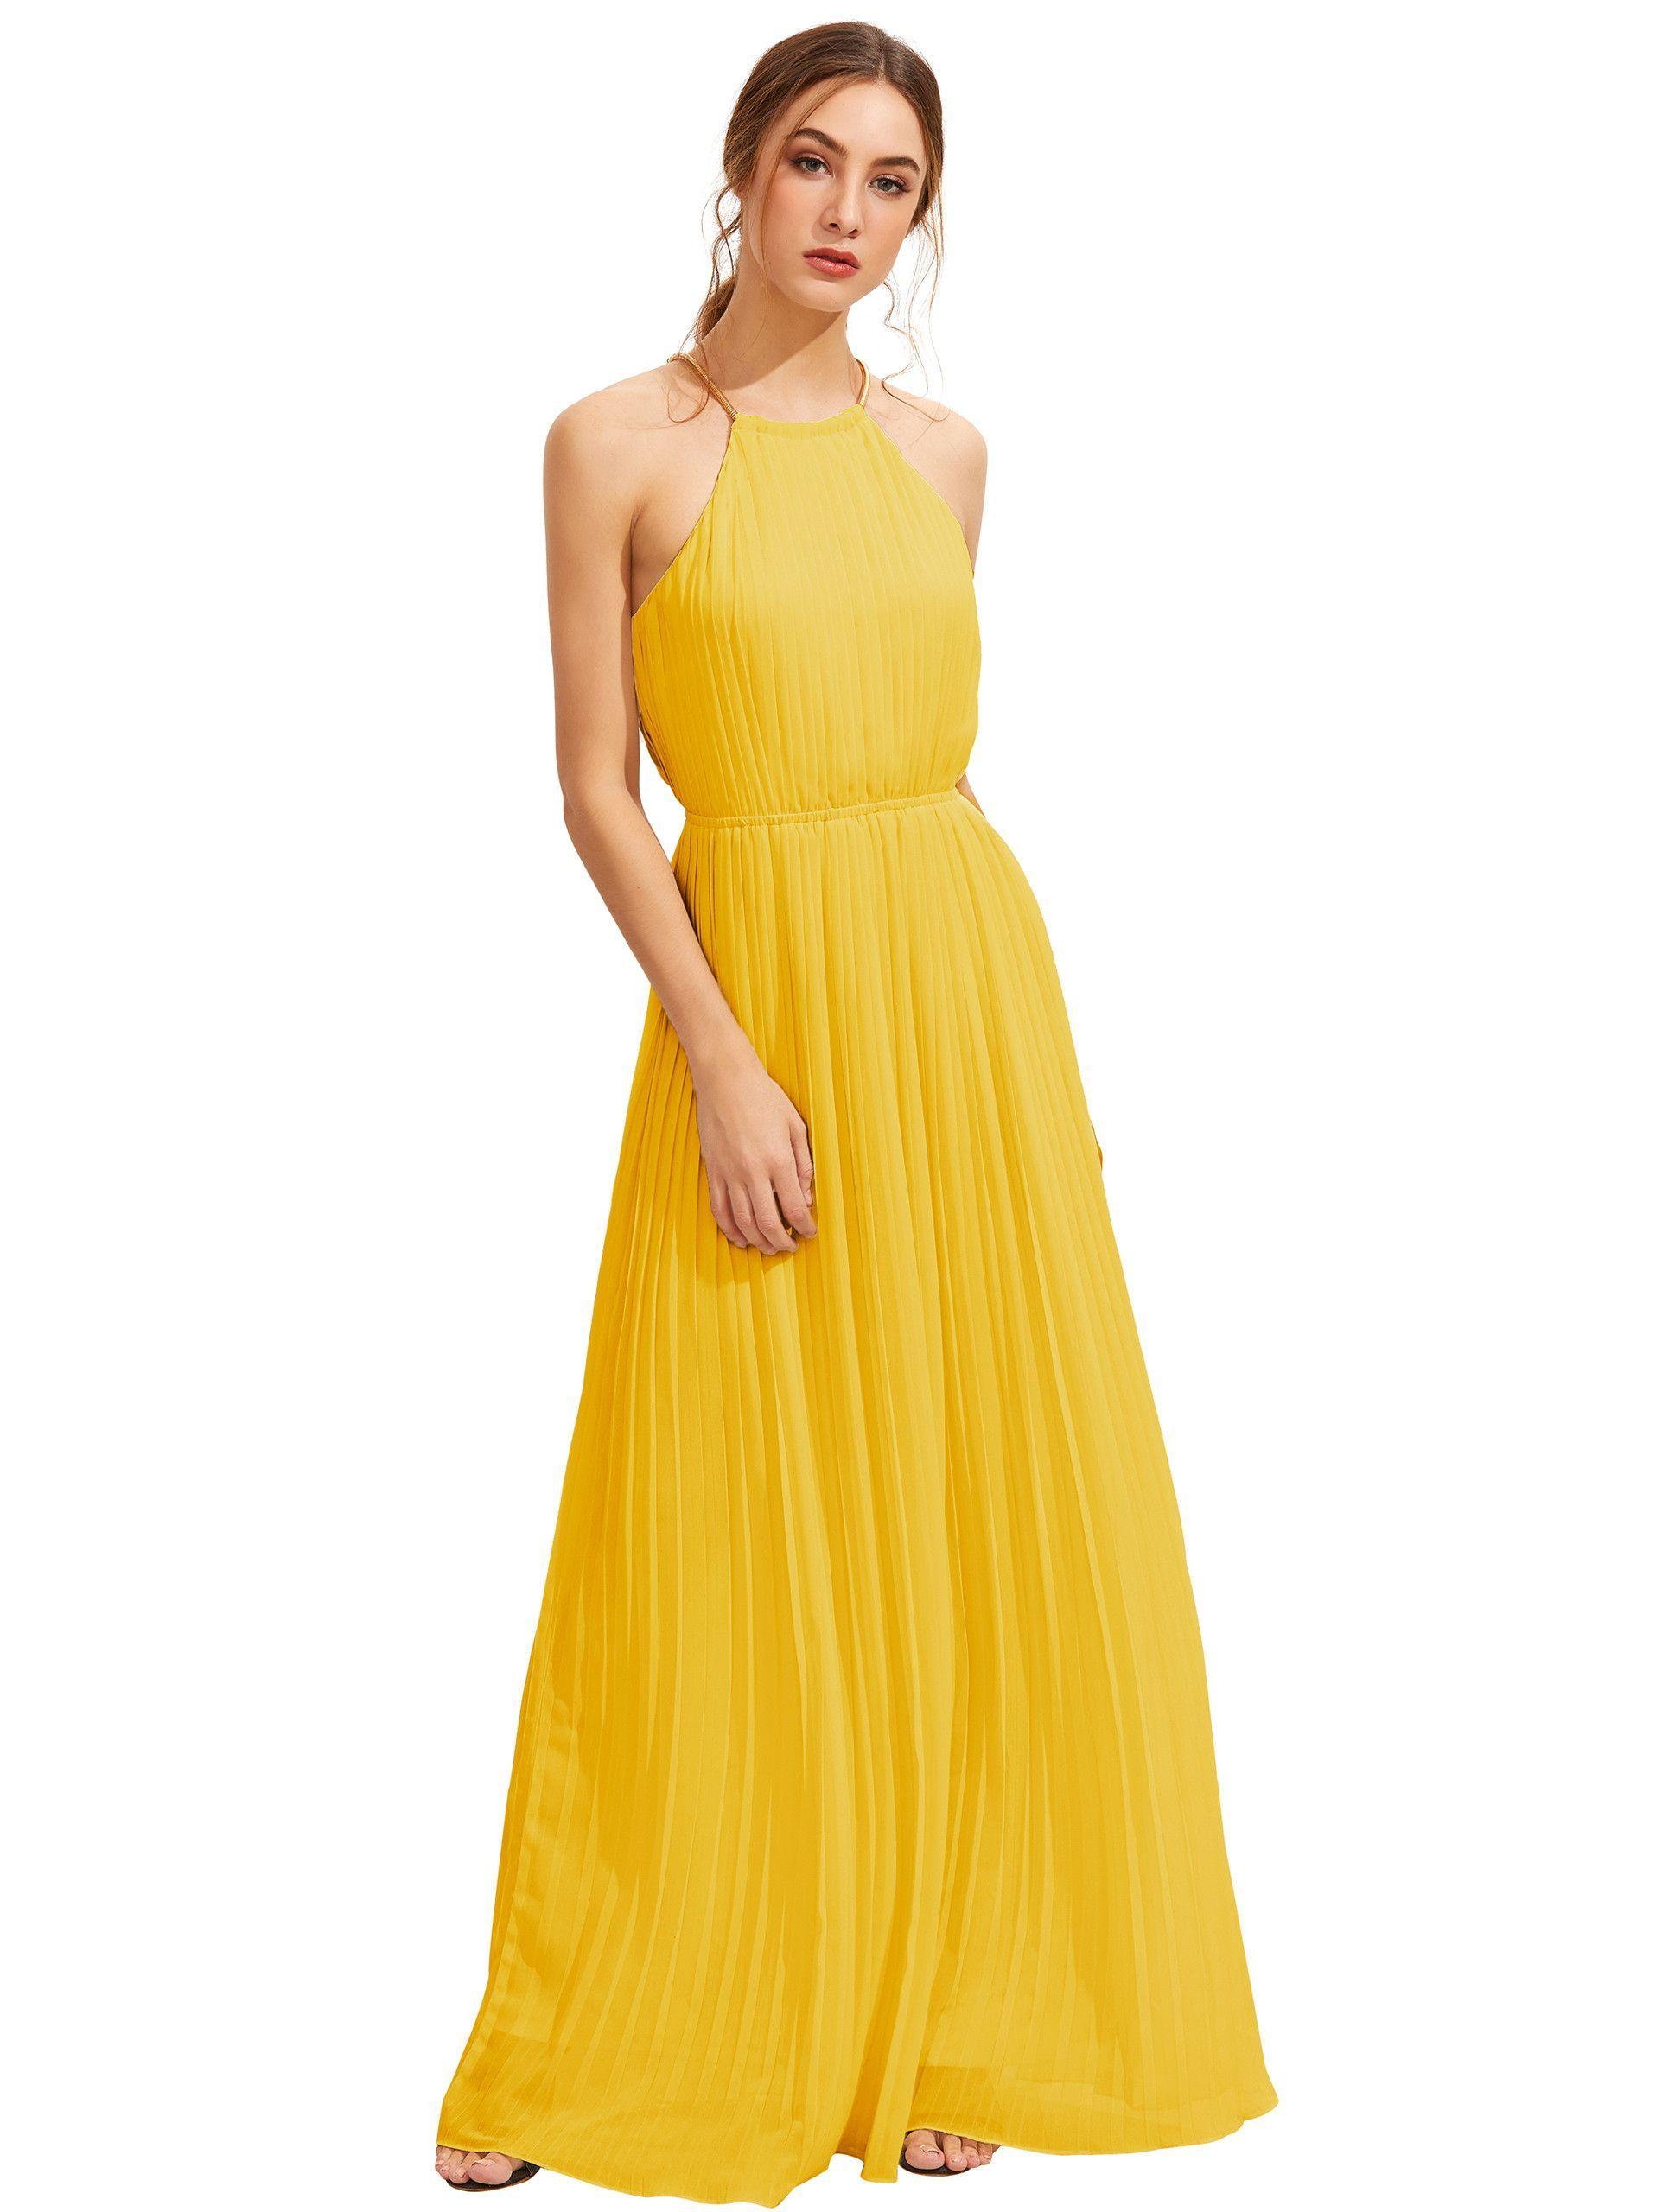 04deaf309044 Fabric: Fabric has no stretch Season: Summer Pattern Type: Plain Sleeve  Length: Sleeveless Color: Yellow Dresses Length: Maxi Style: Elegant, ...